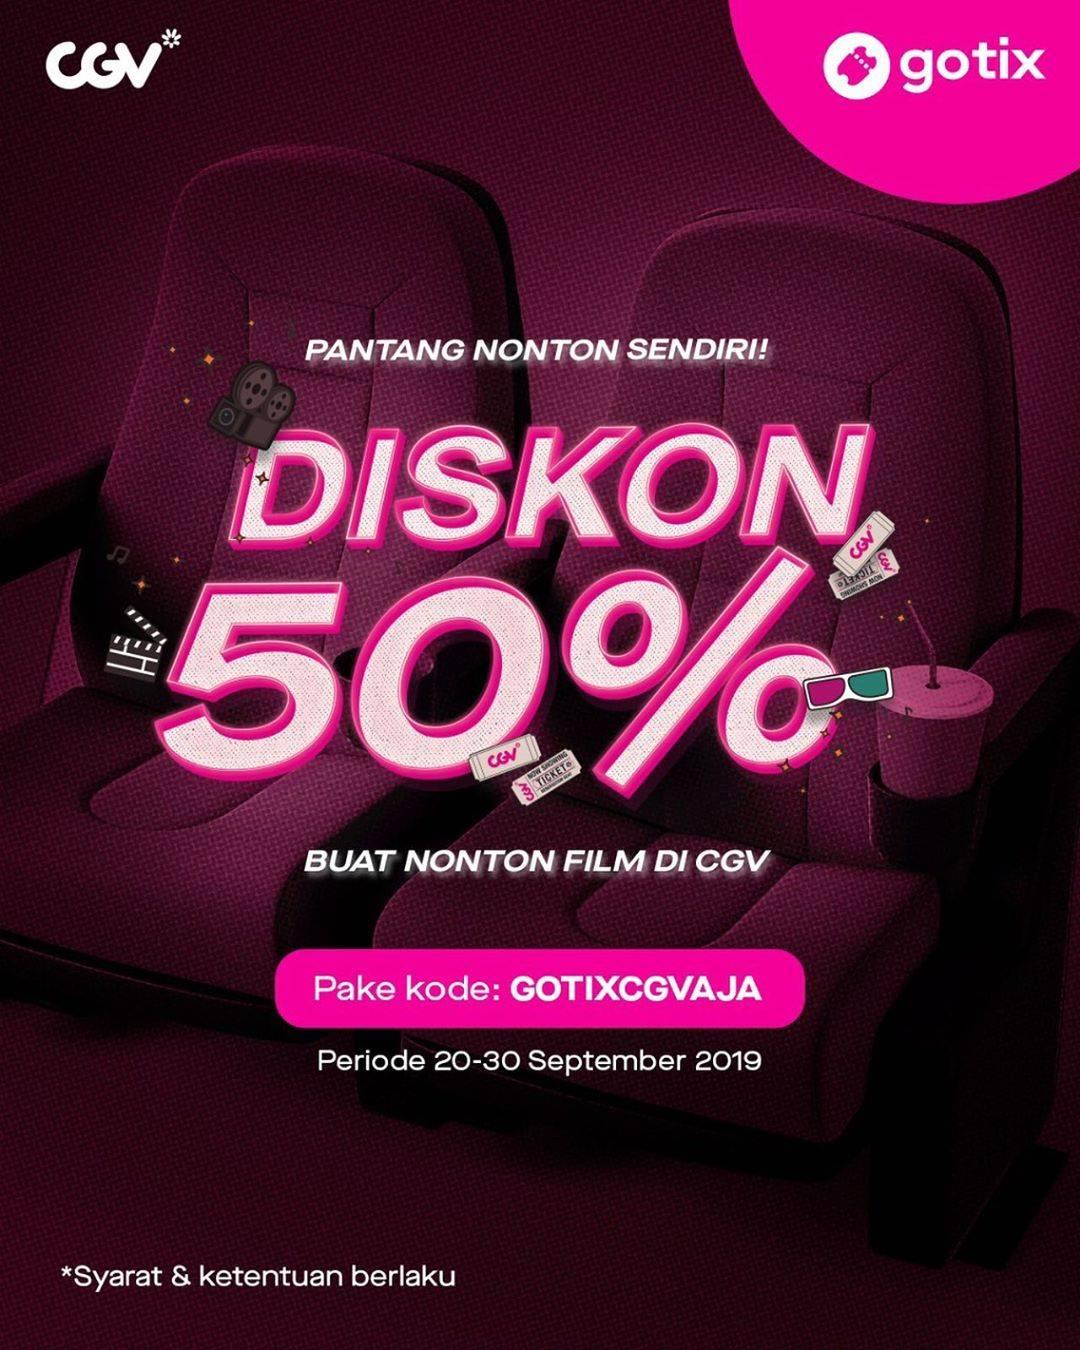 GO-TIX Promo DISKON 50% untuk pemesanan Tiket Nonton di CGV